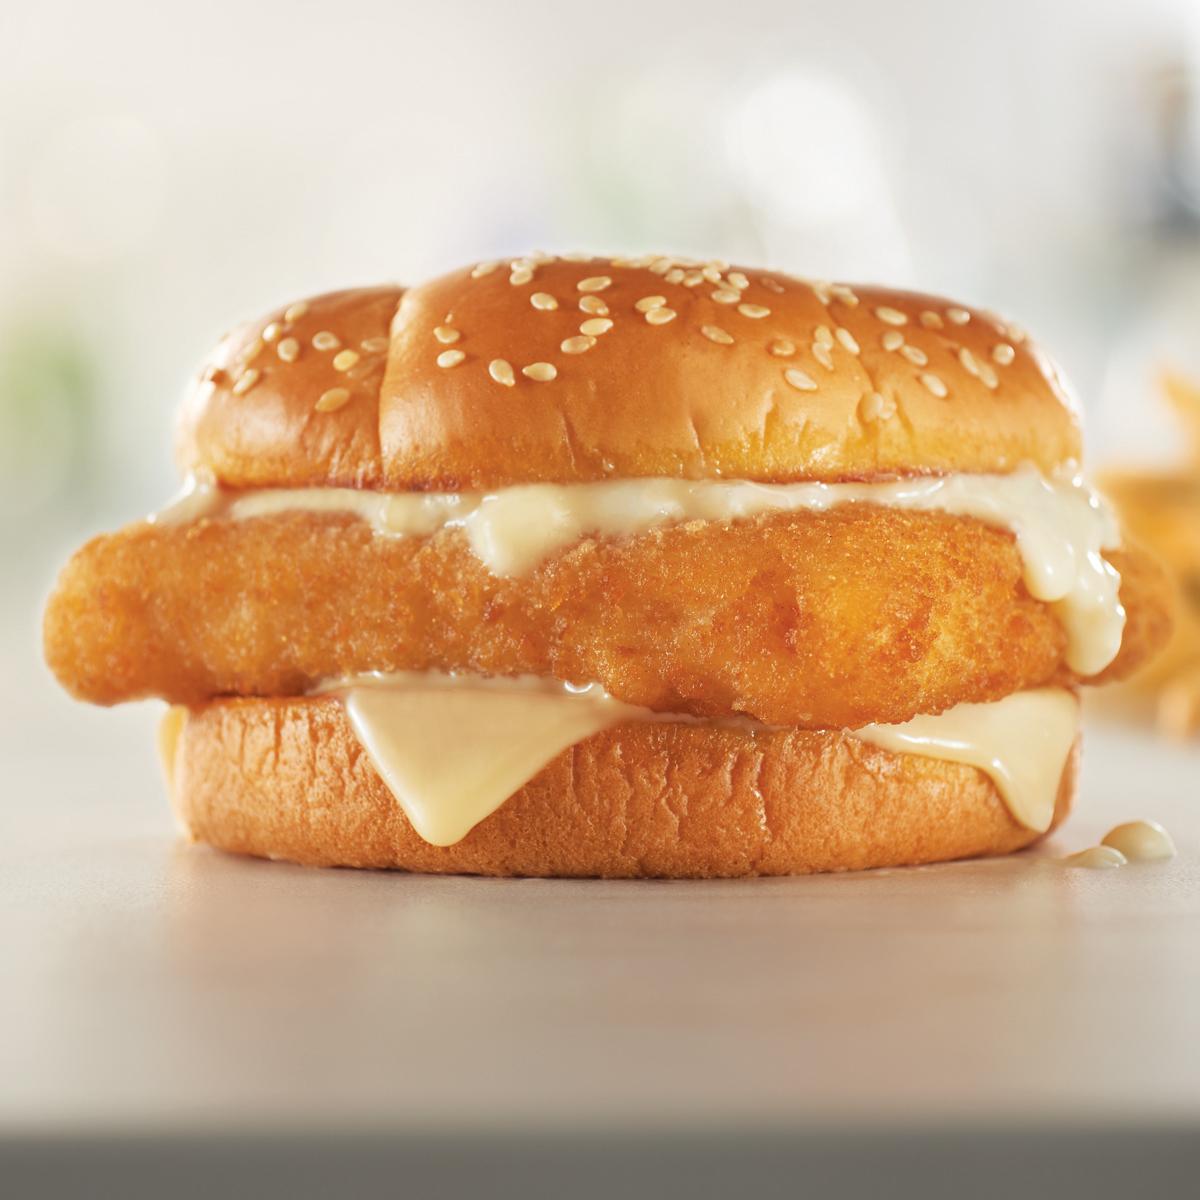 Crispy Cod Fish Sandwich